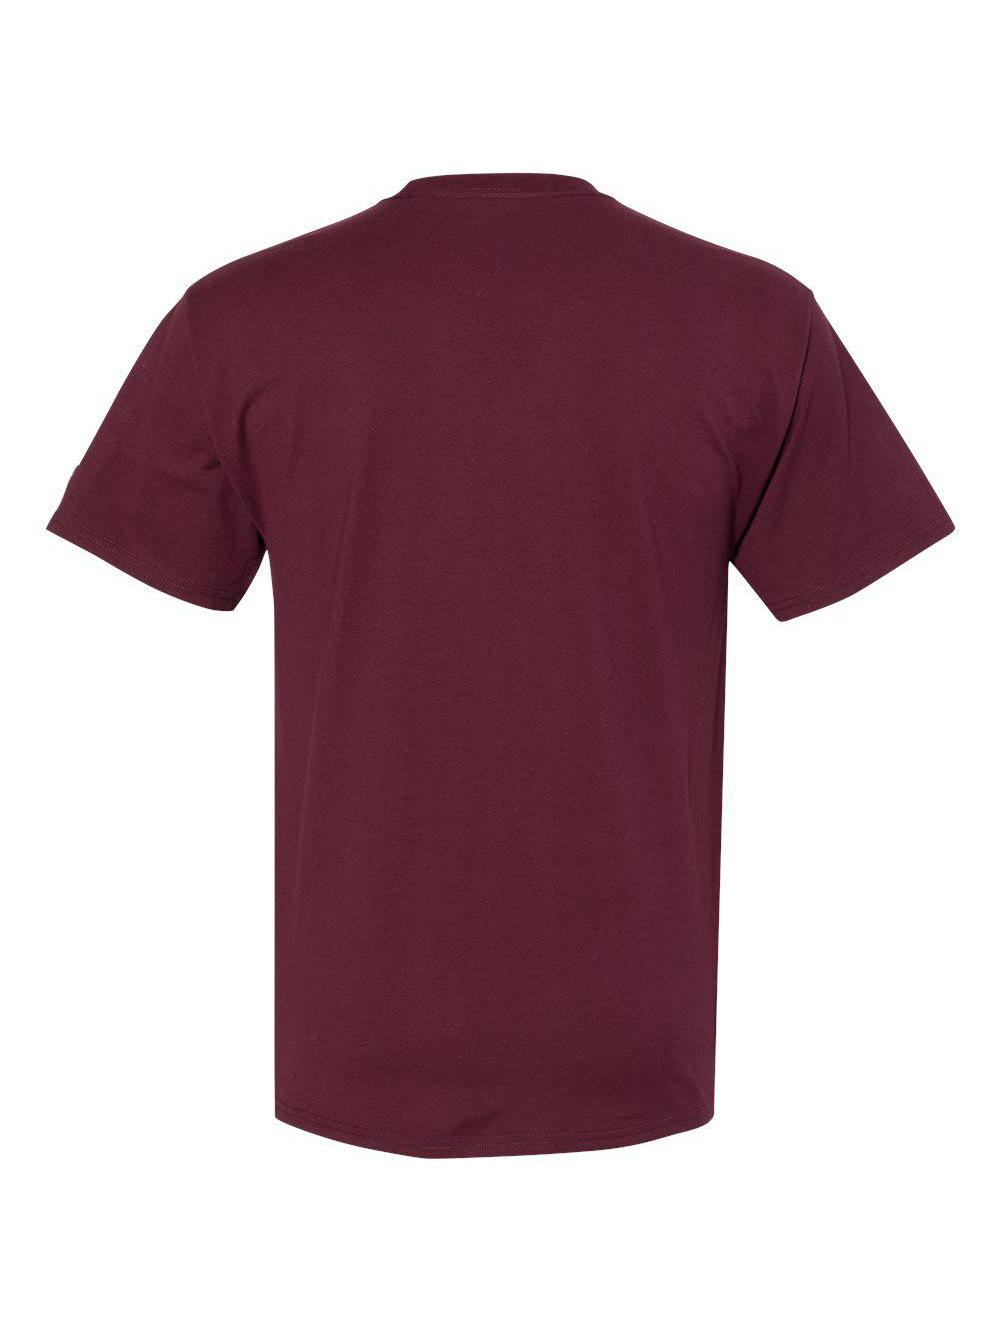 Champion-Premium-Classics-Short-Sleeve-T-Shirt-CP10 thumbnail 27